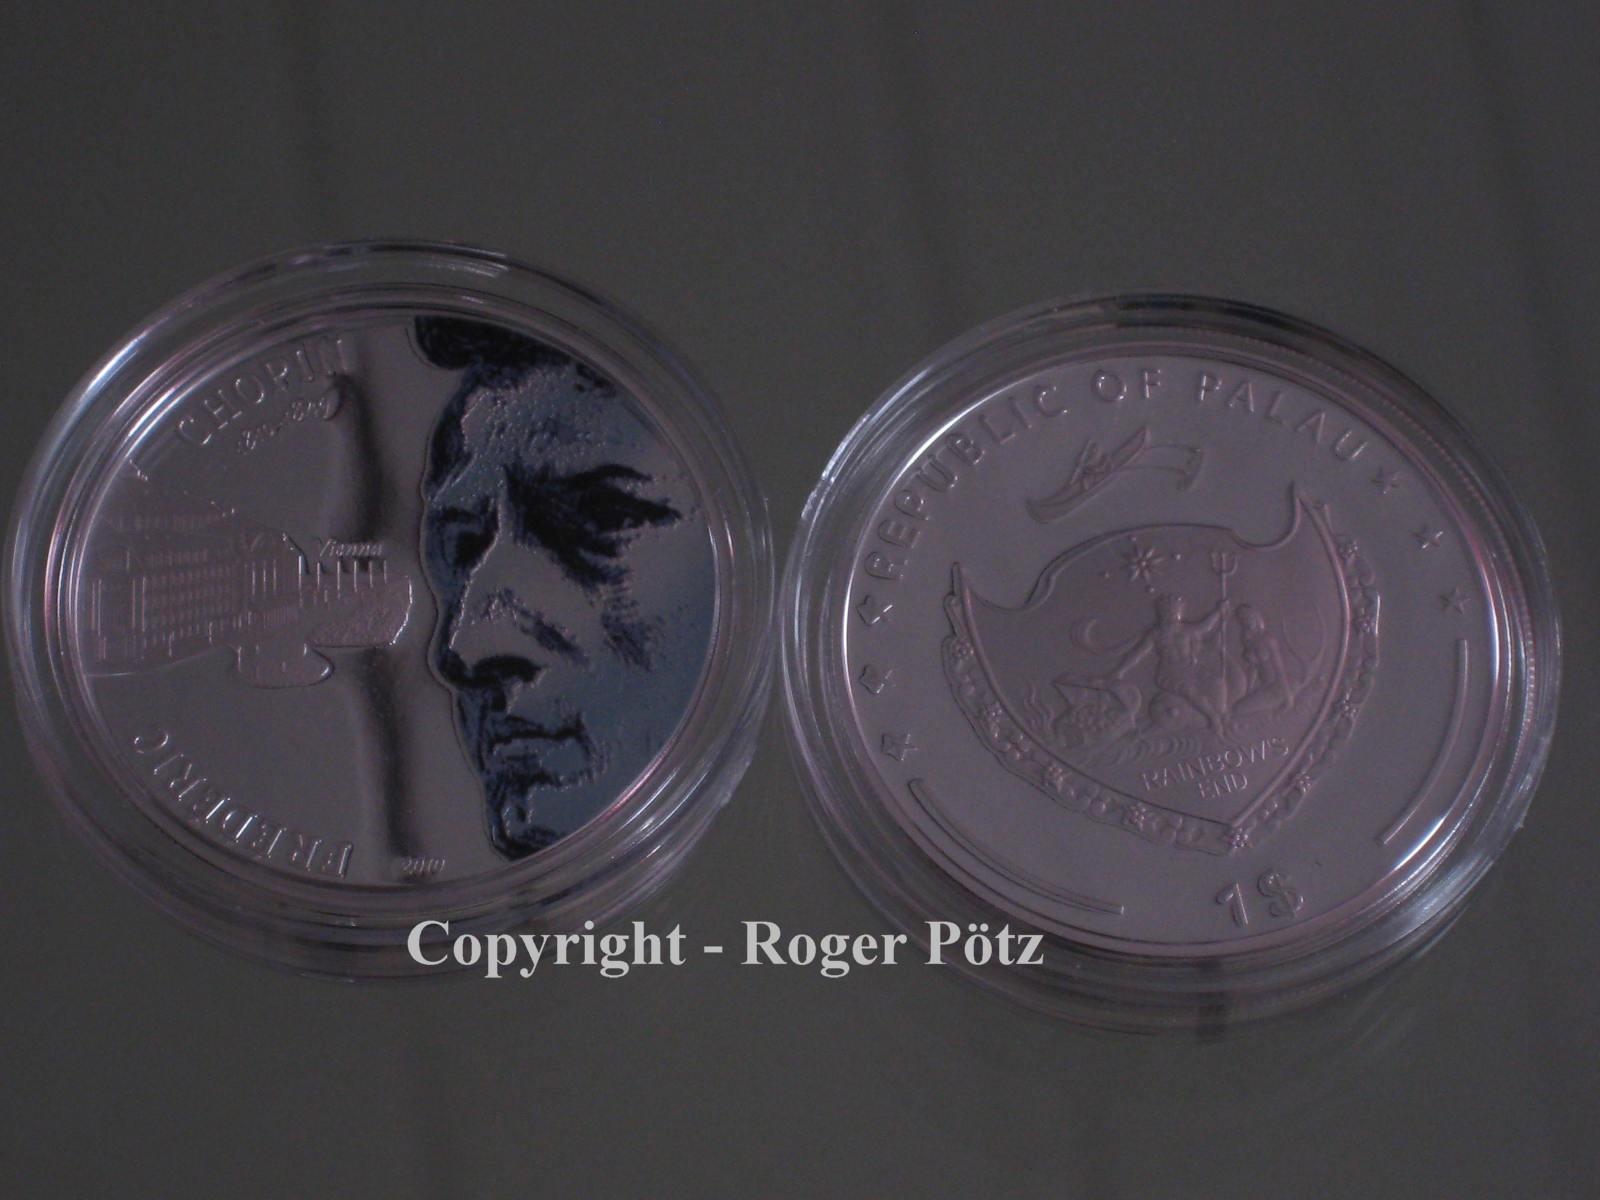 1 Dollar 2010 Palau 1 $ Palau 2010 Chopin in Wien PP Hologramm nur 999 Exemplare PP ( polierte Platte )